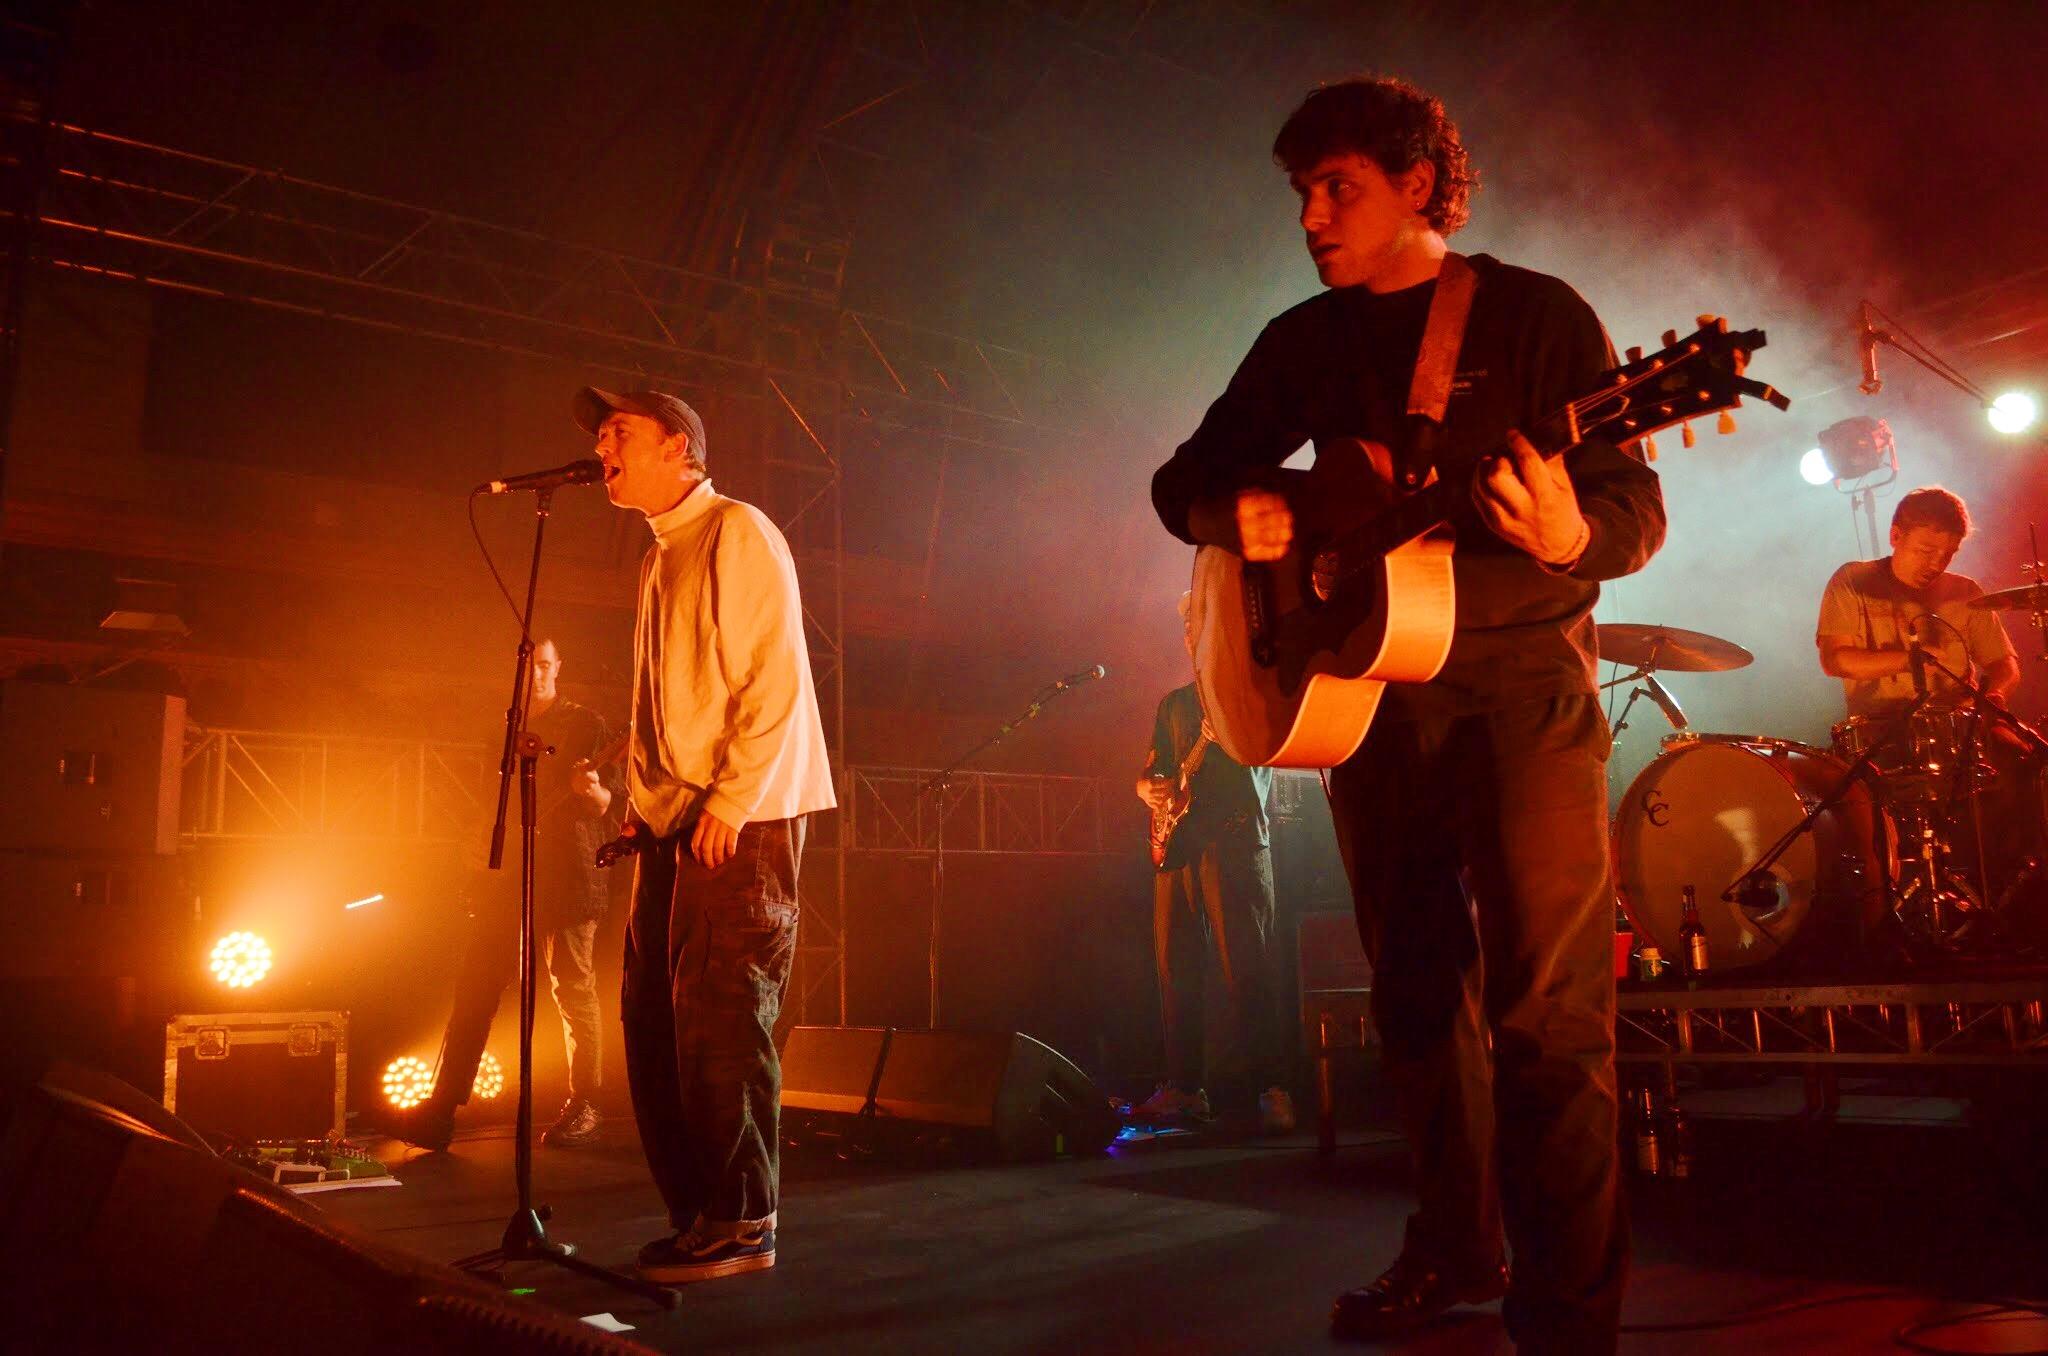 dmas music live review melbourne photo credit ryley clarke savage thrills savagethrills 13